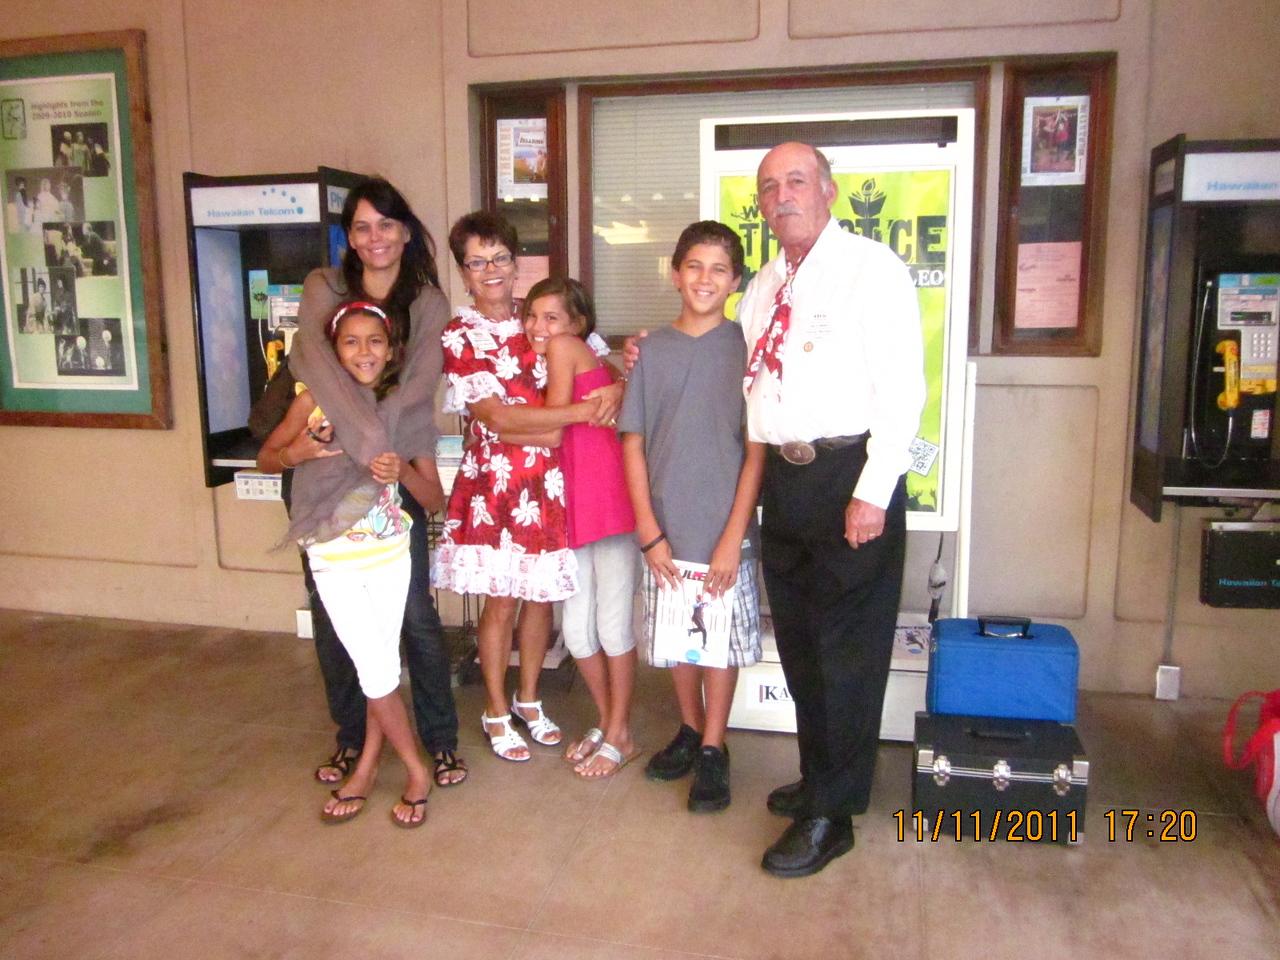 The Quam family.. Jerry & Barbara with daughter Heidi and 3 grandchildren. Myles almost 13